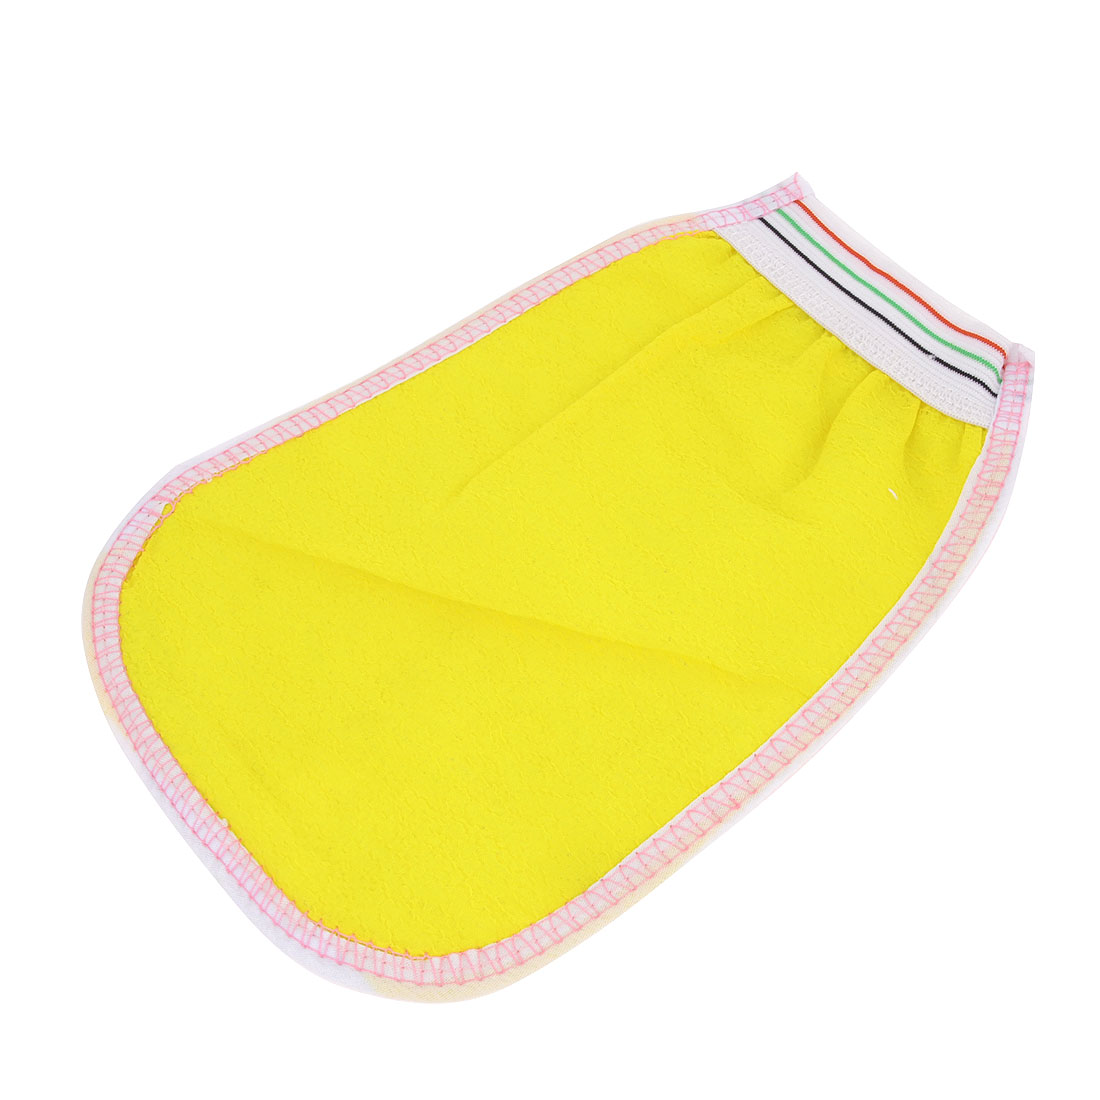 Yellow White Exfoliating Mesh Sponge Bath Glove Cleaner